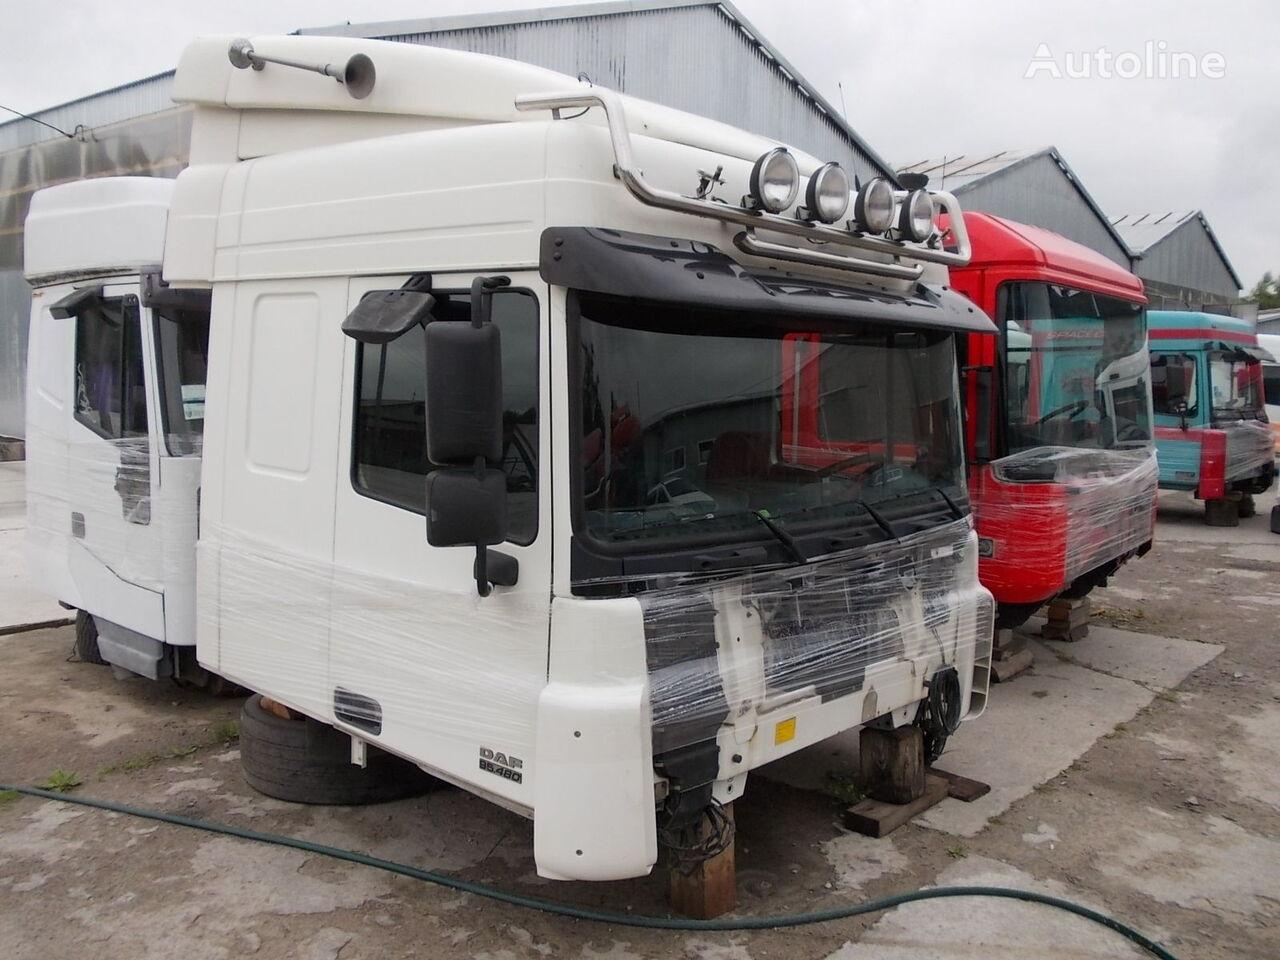 DAF euro 3 kabina za DAF xf 95xf tegljača